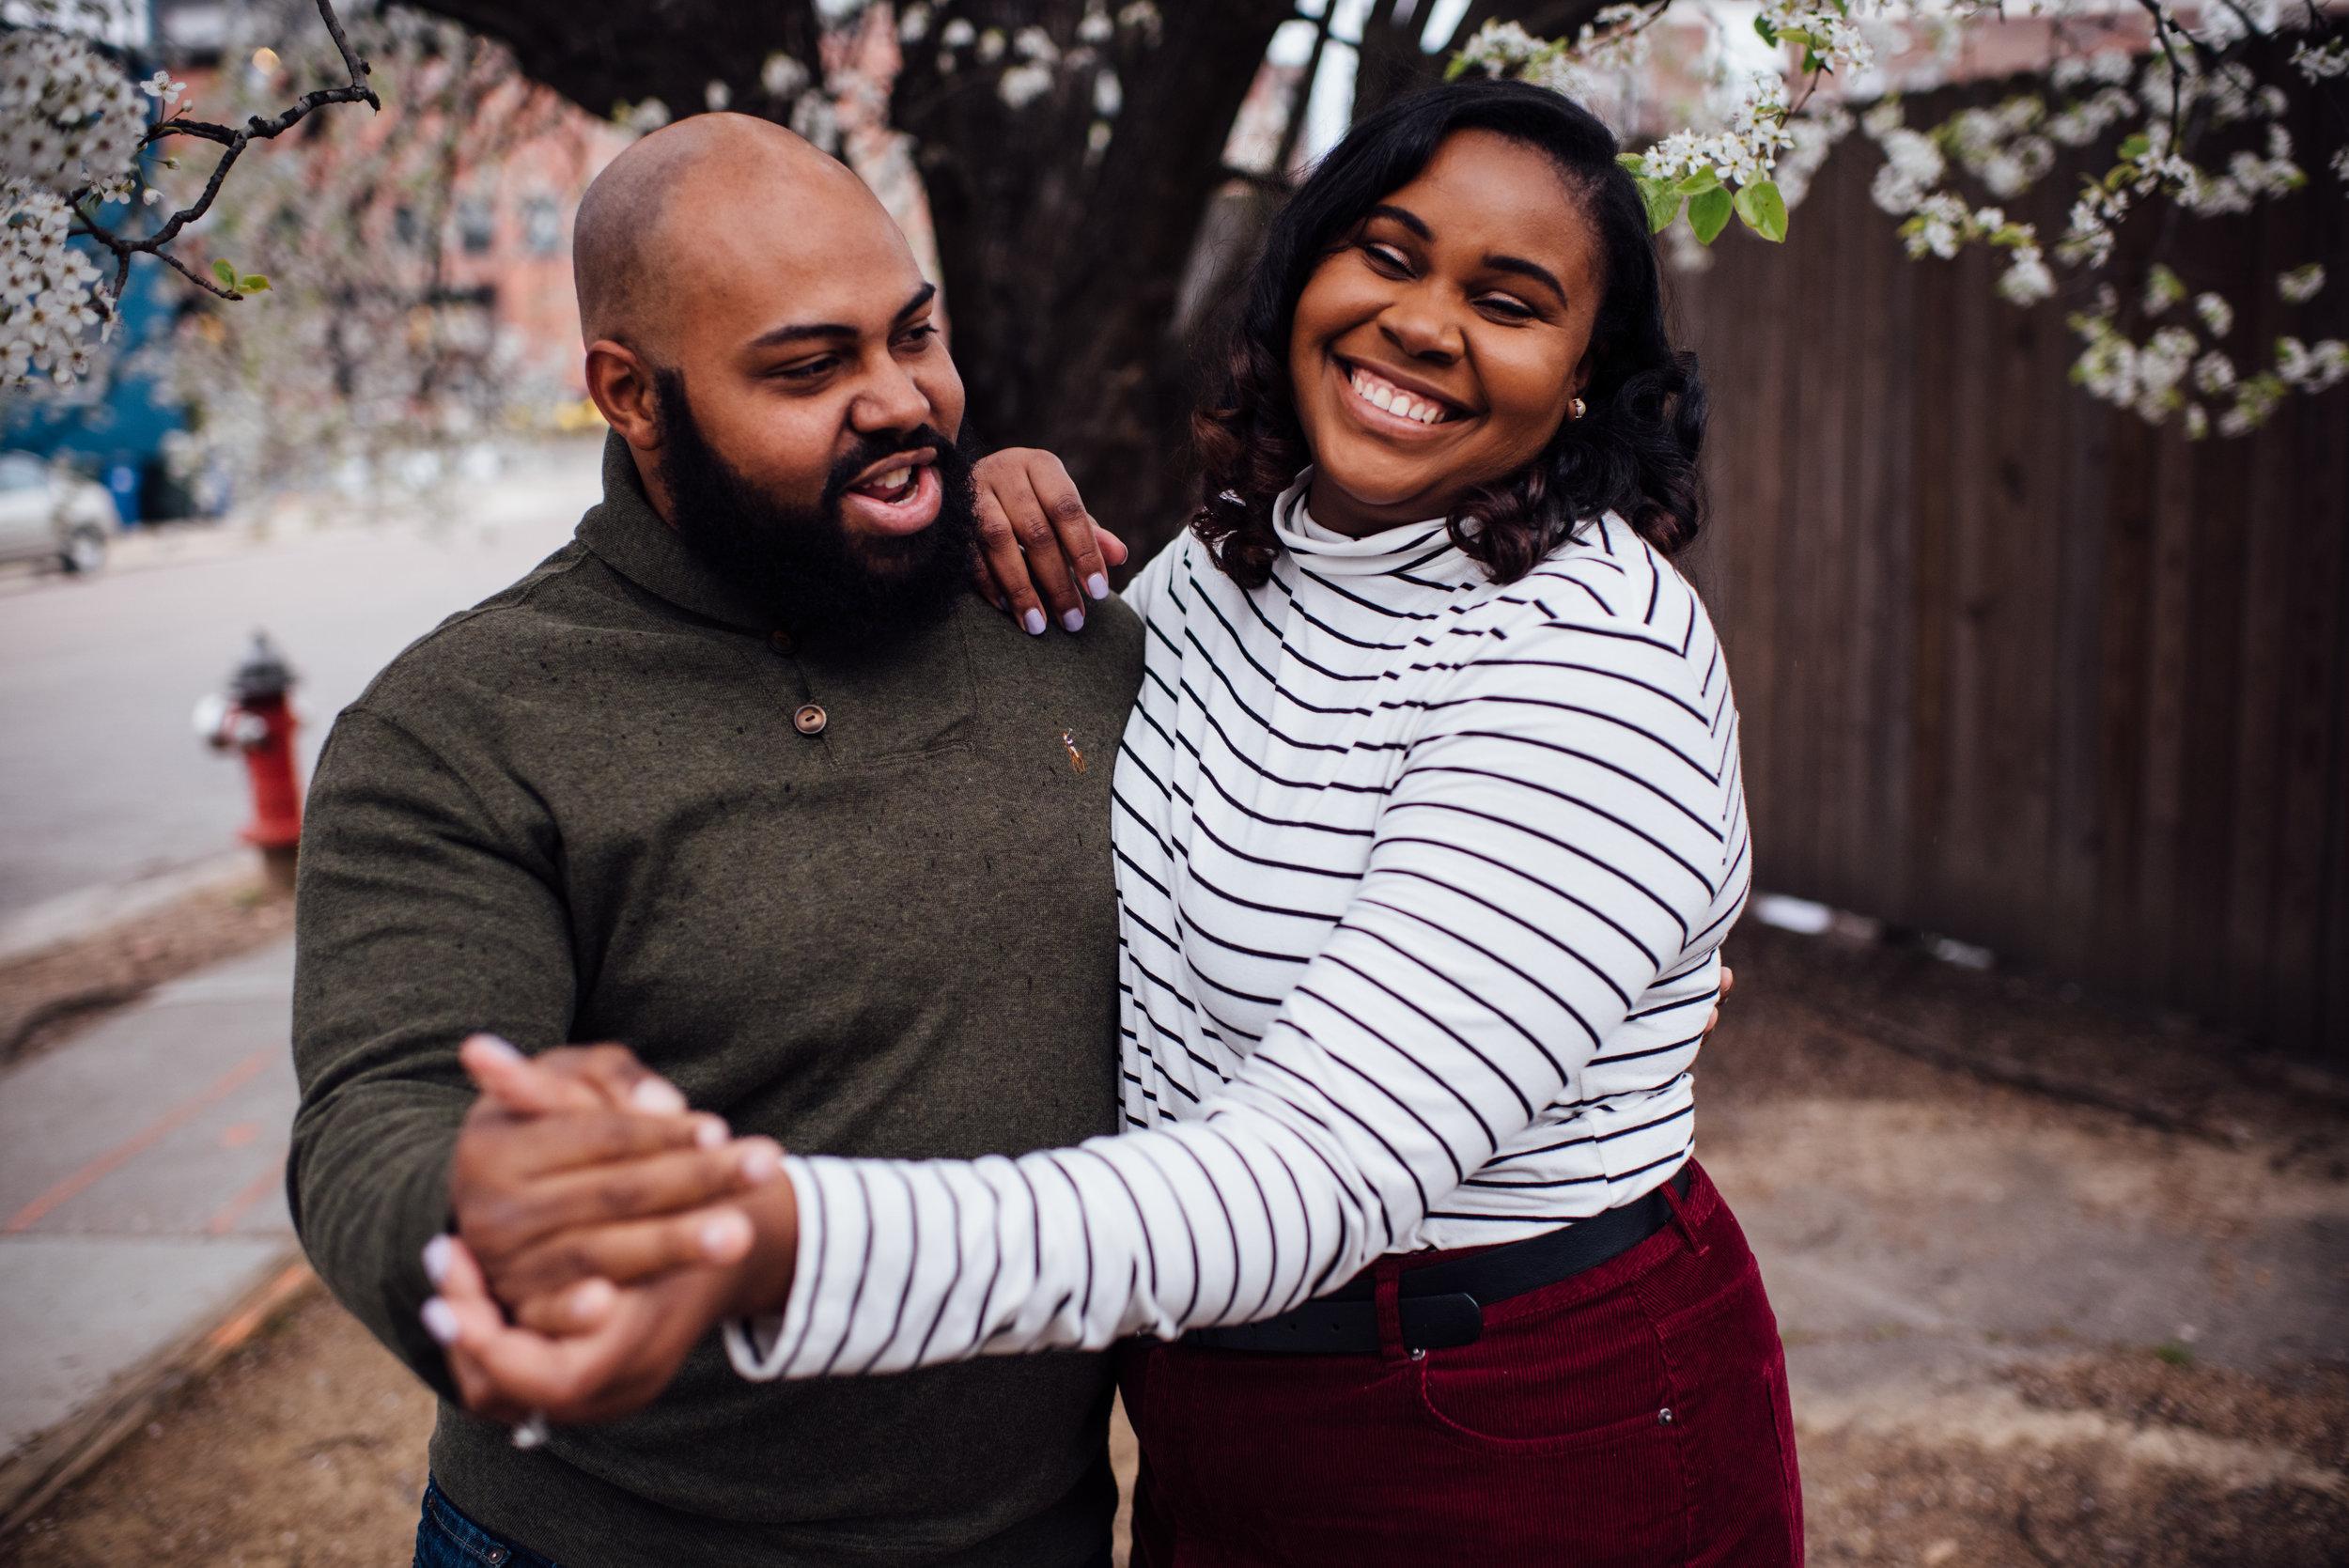 North Carolina Wedding Photographer - Raleigh Wedding Photographer - Downtown Raleigh Engagement - Raleigh Engagement - Durham Wedding Photographer - Boxcar Engagement